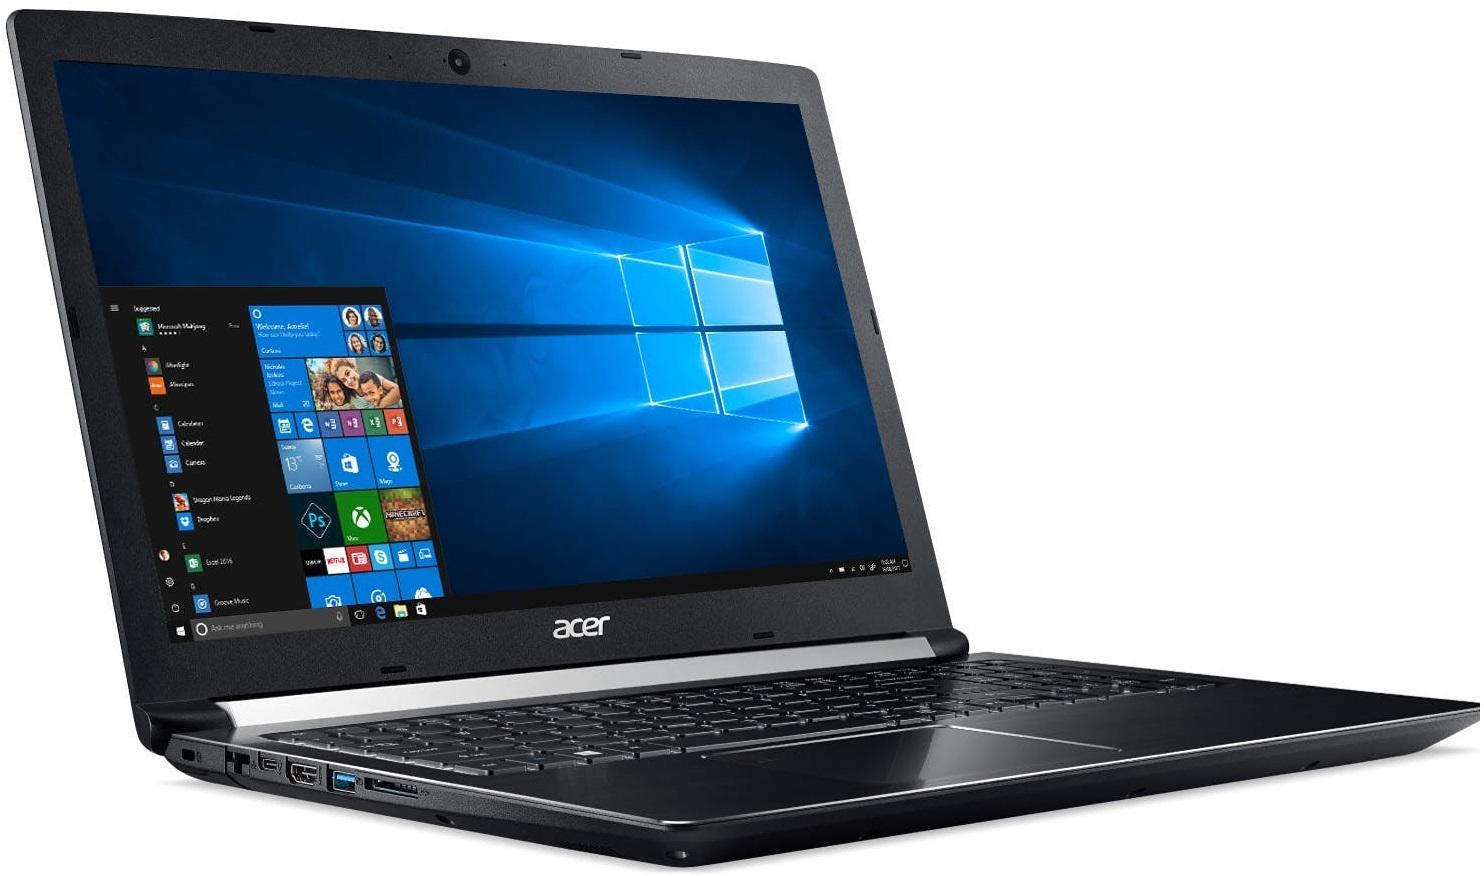 "Acer Aspire 7 17.3"" Entry Level Gaming Laptop | Intel Core i5 | NVIDIA GTX 1050 4GB | 8GB RAM + 256GB SSD | image"